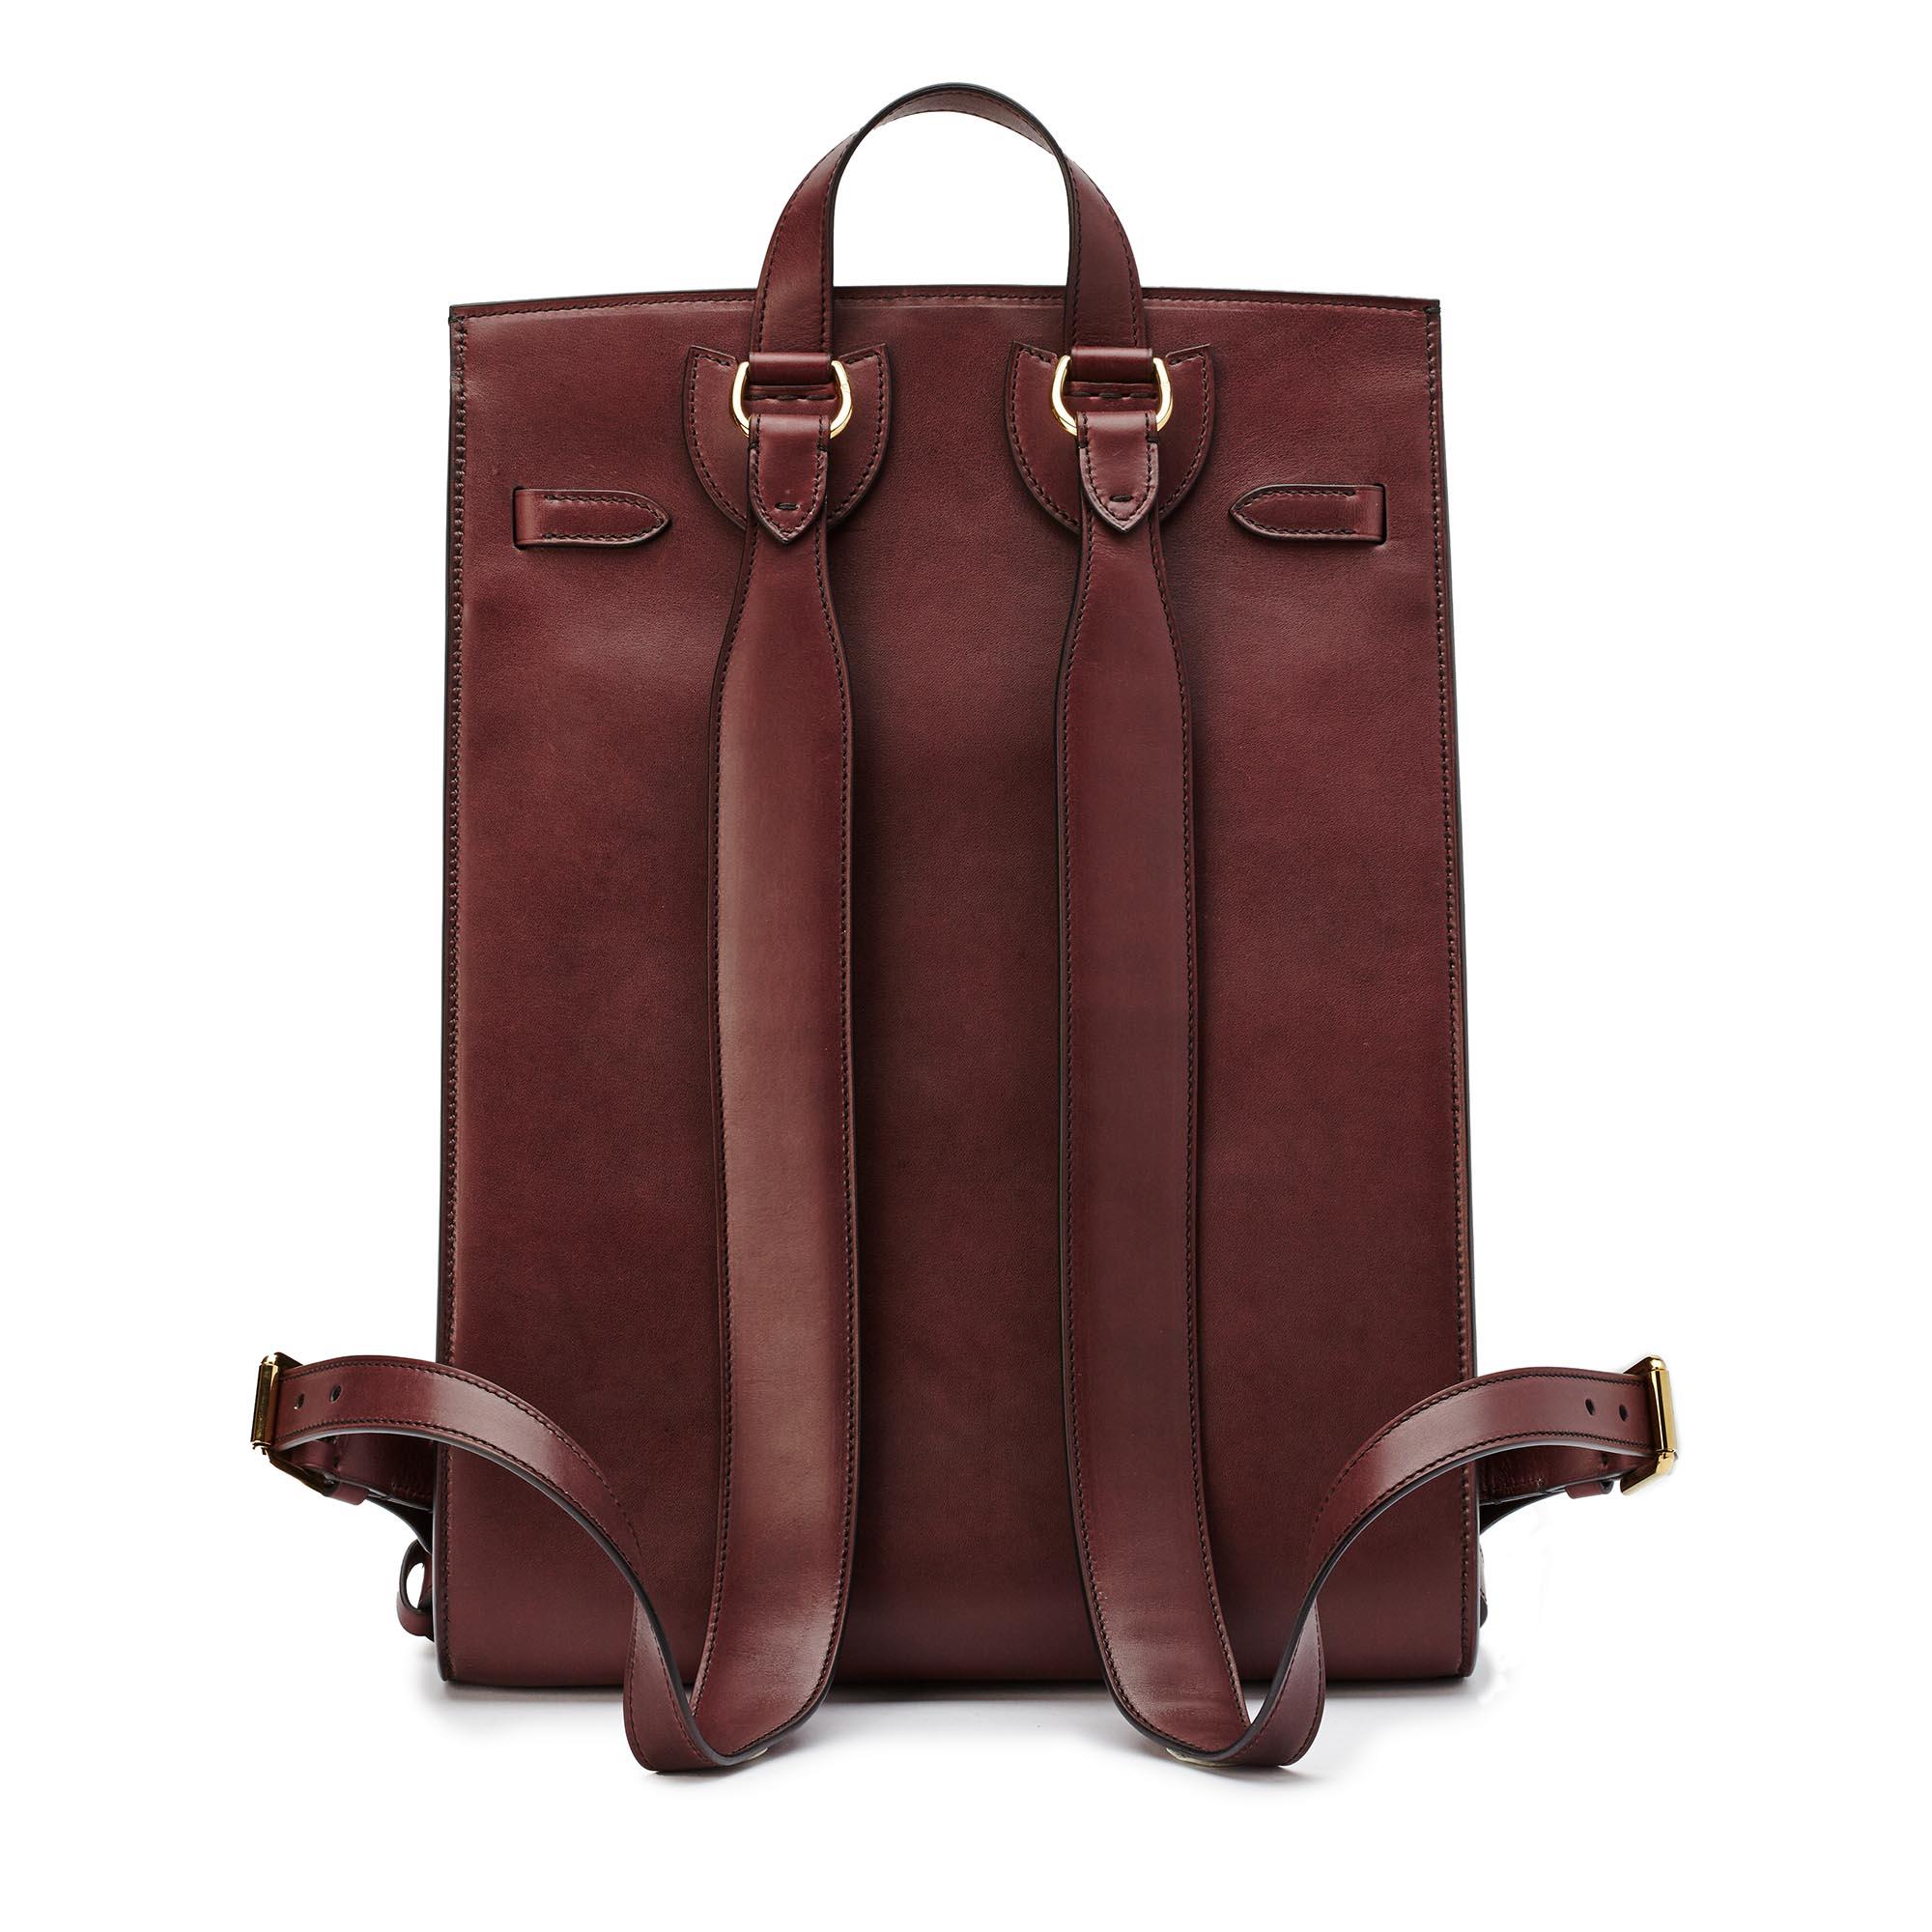 Signature-Backpack-bordeaux-french-calf-bag-Bertoni-1949_02